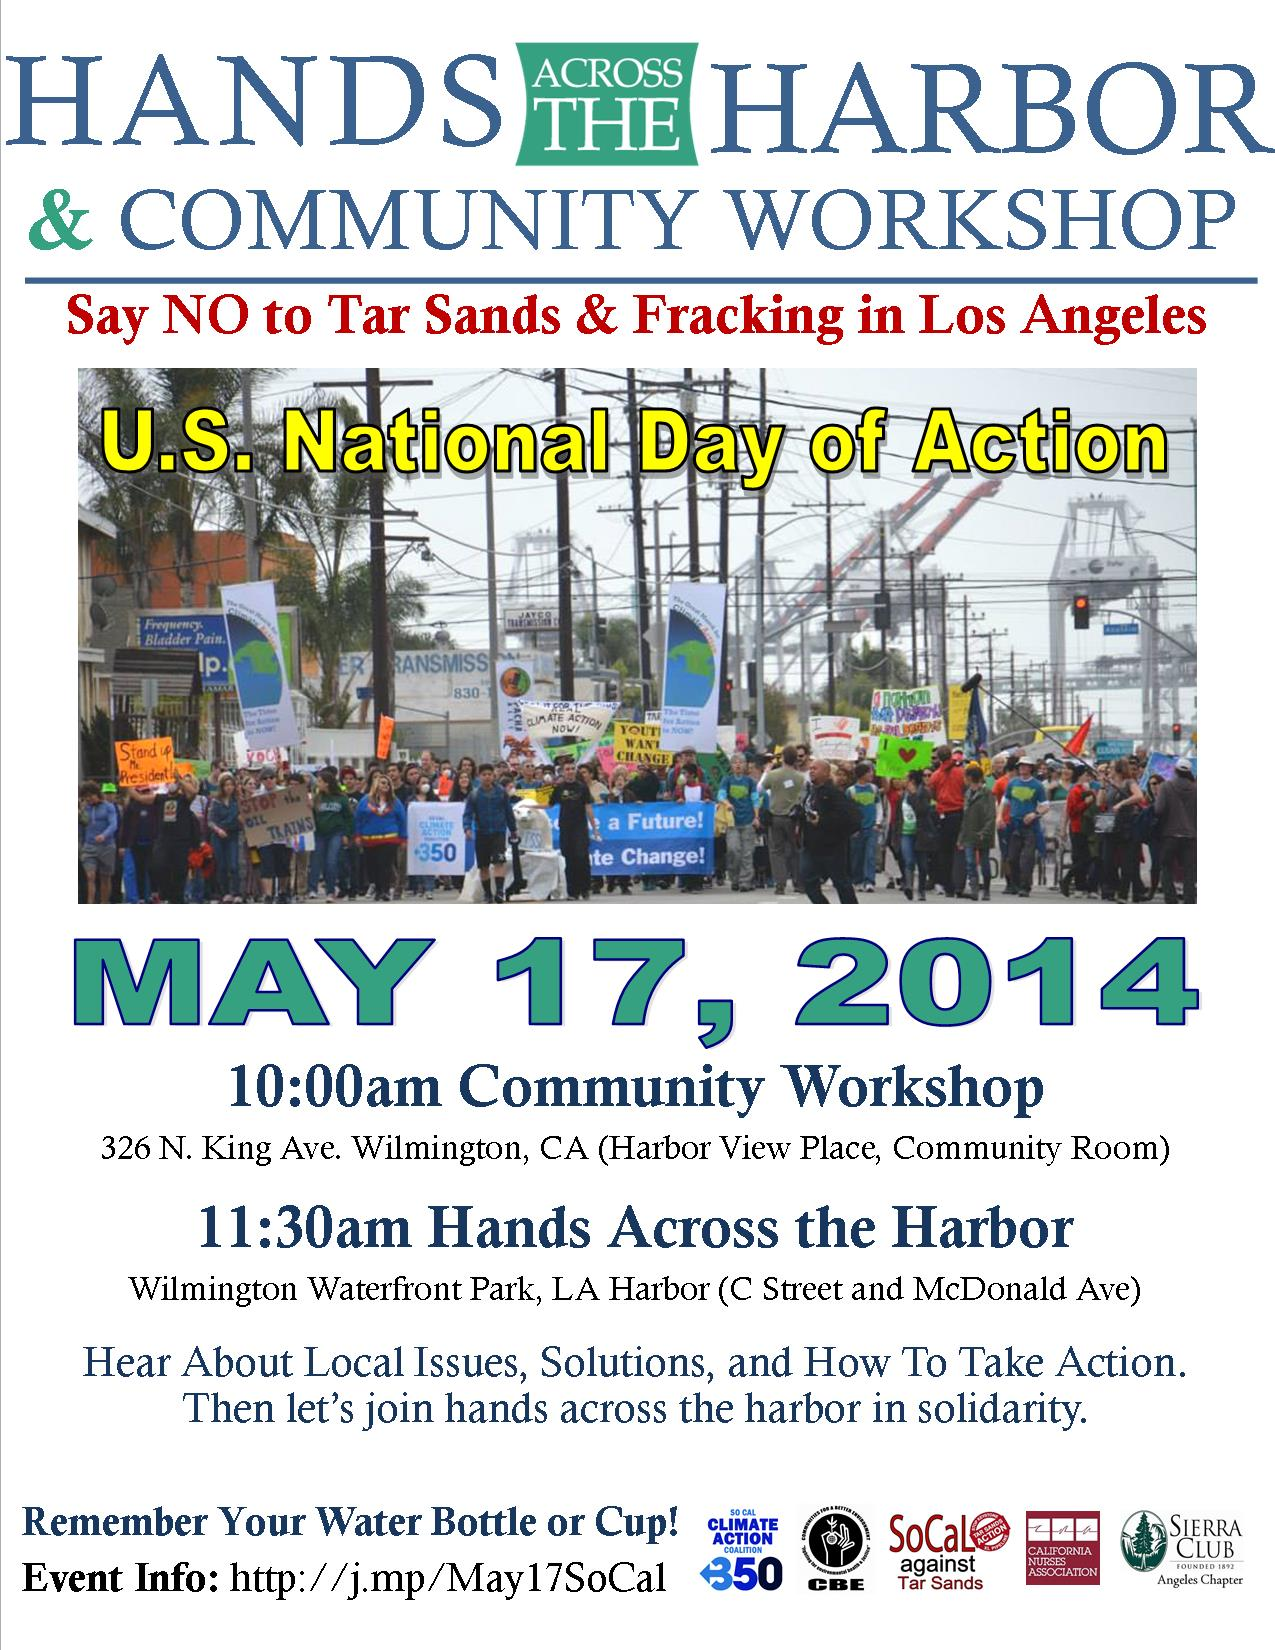 Jpg_hands_across_harbor_poster_final_rally_pic_english